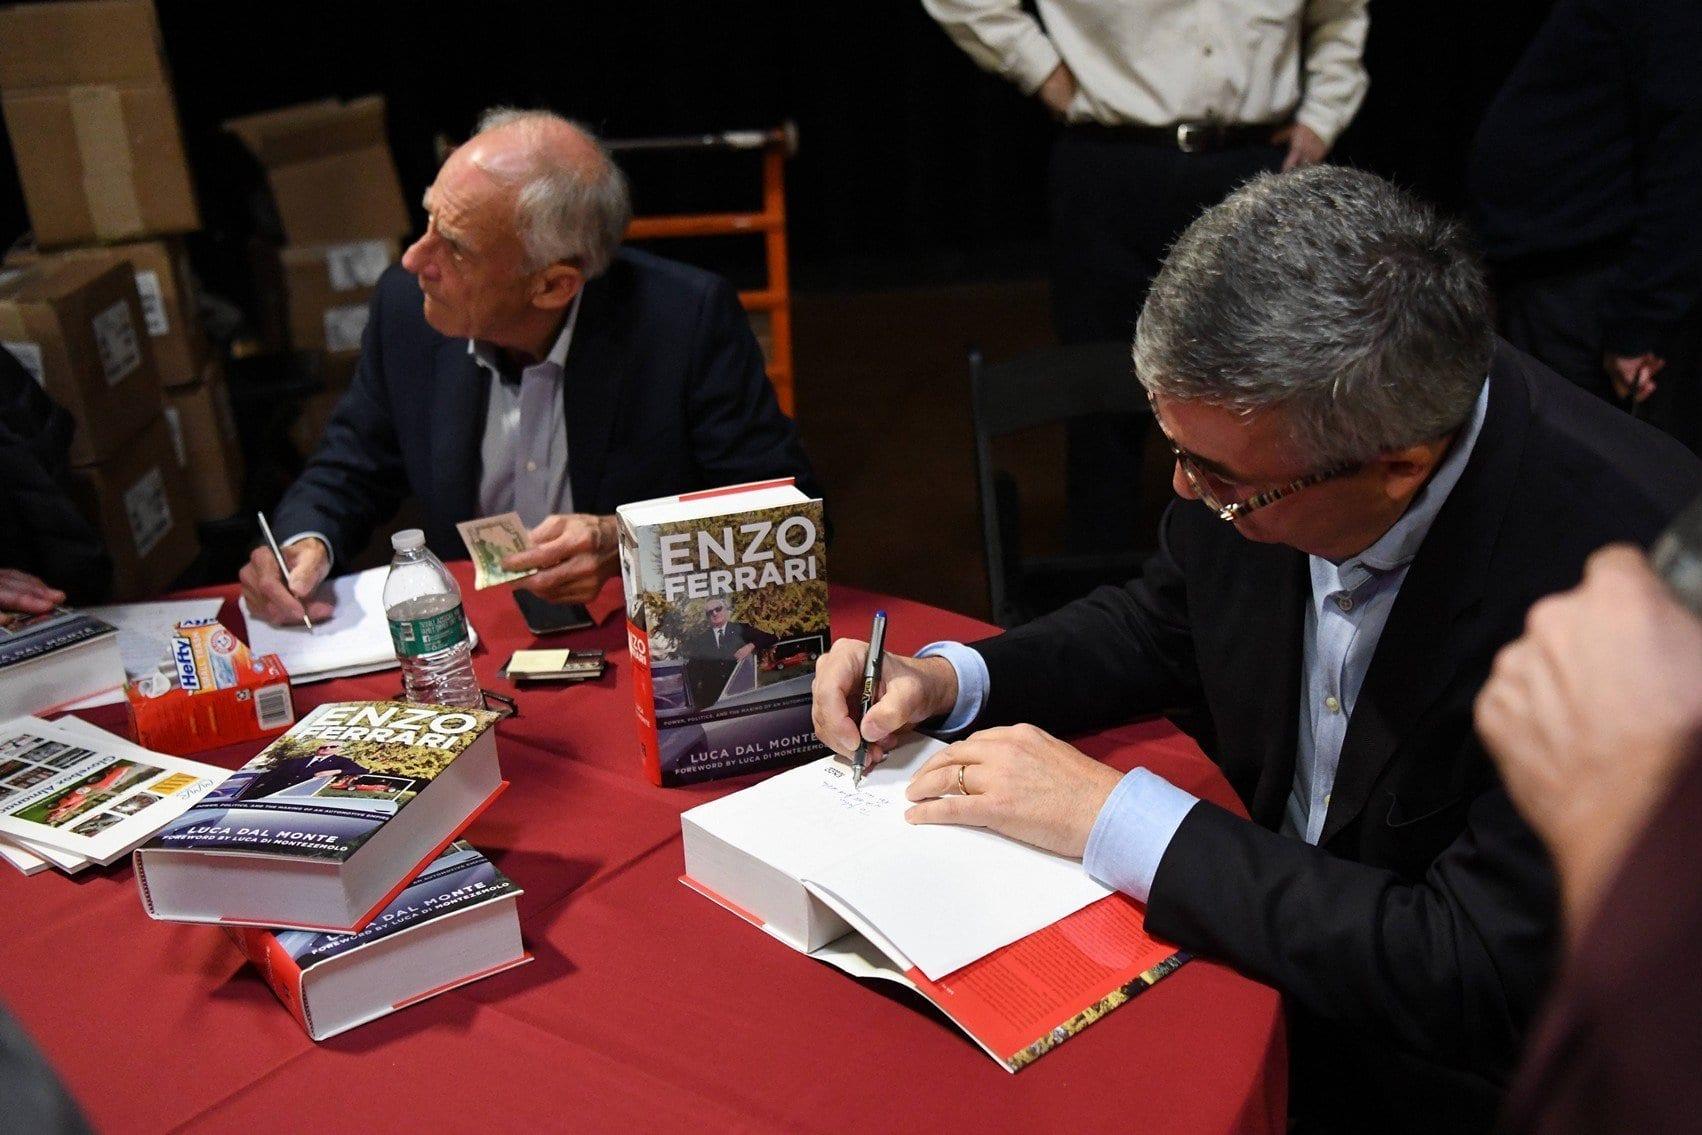 Luca Dal Monte Book Signing